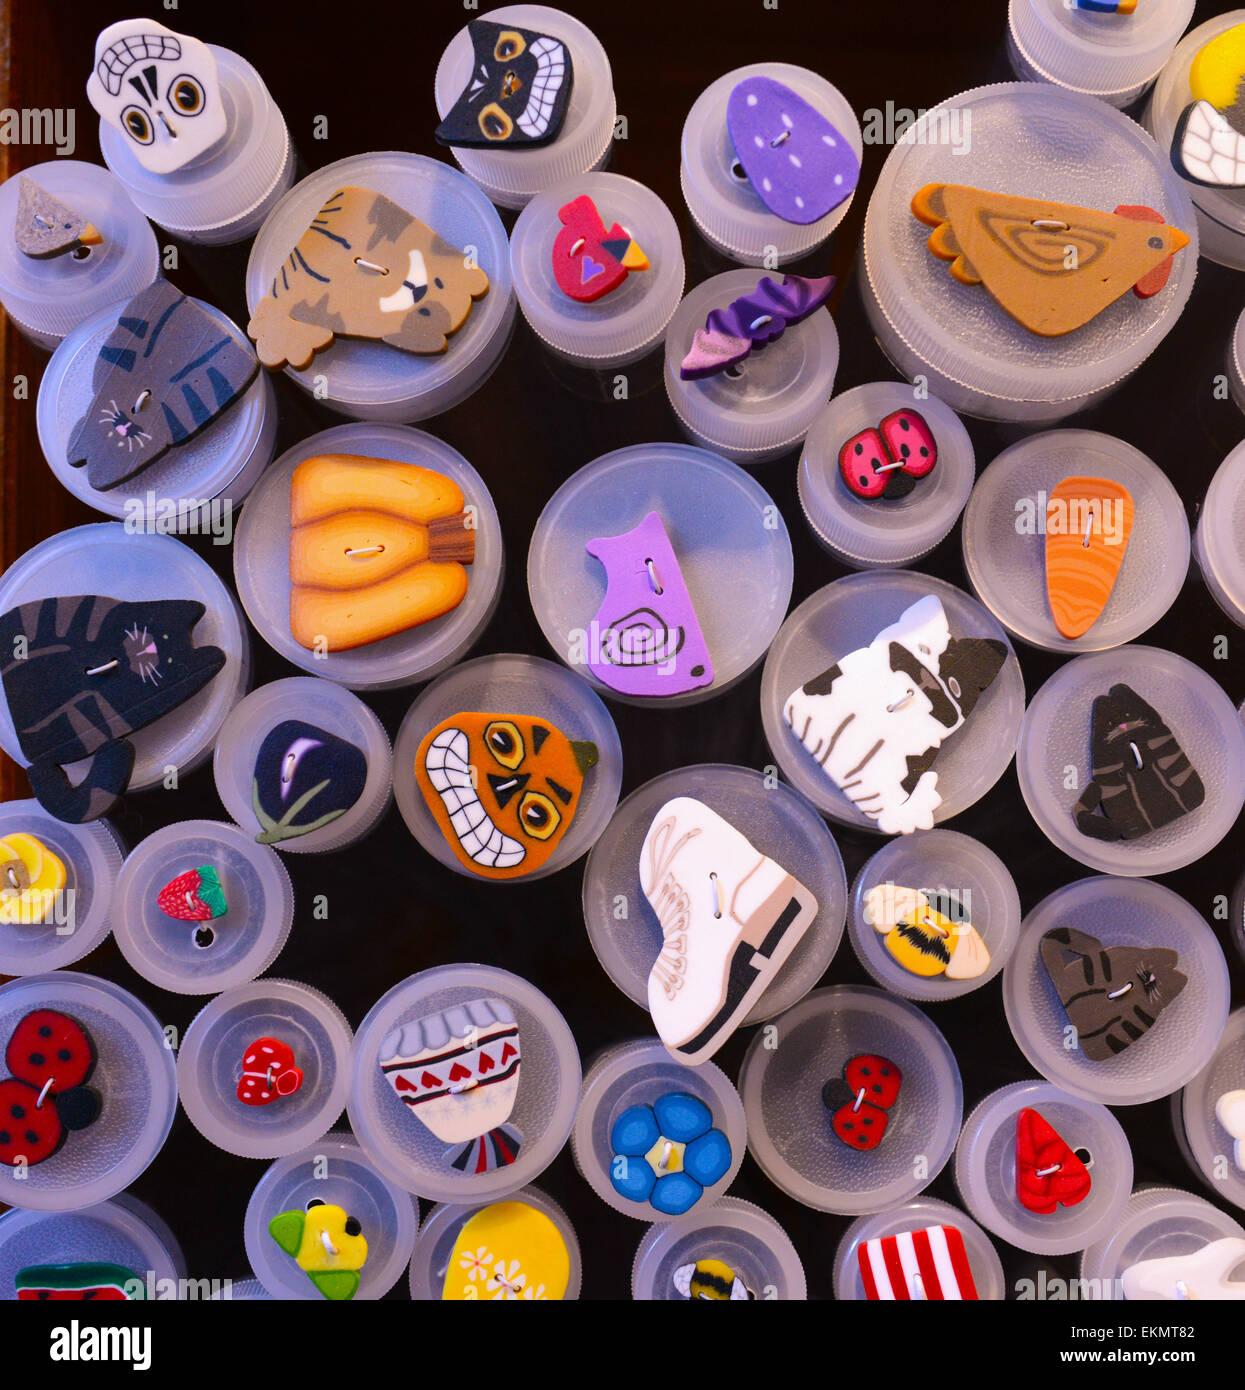 Button Display Stock Photos & Button Display Stock Images